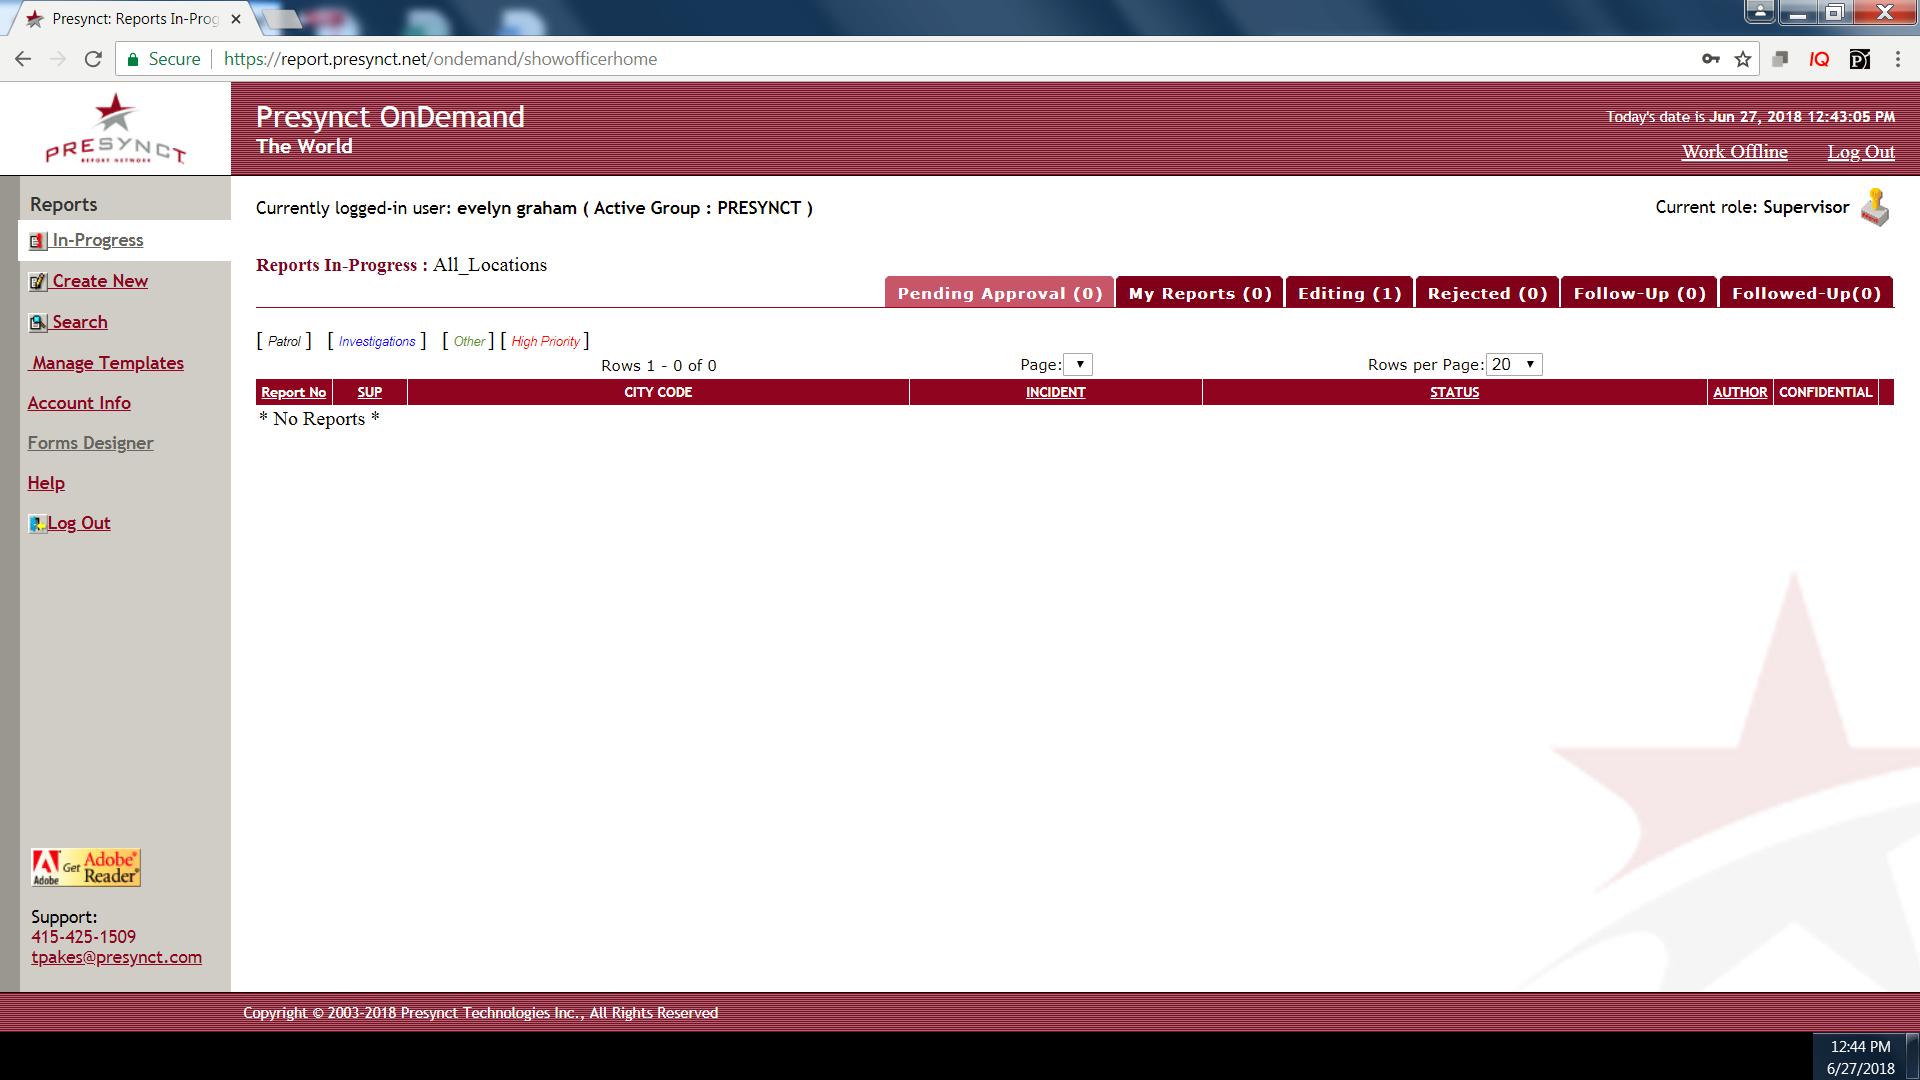 Presynct_OnDemand Software - Reports in progress